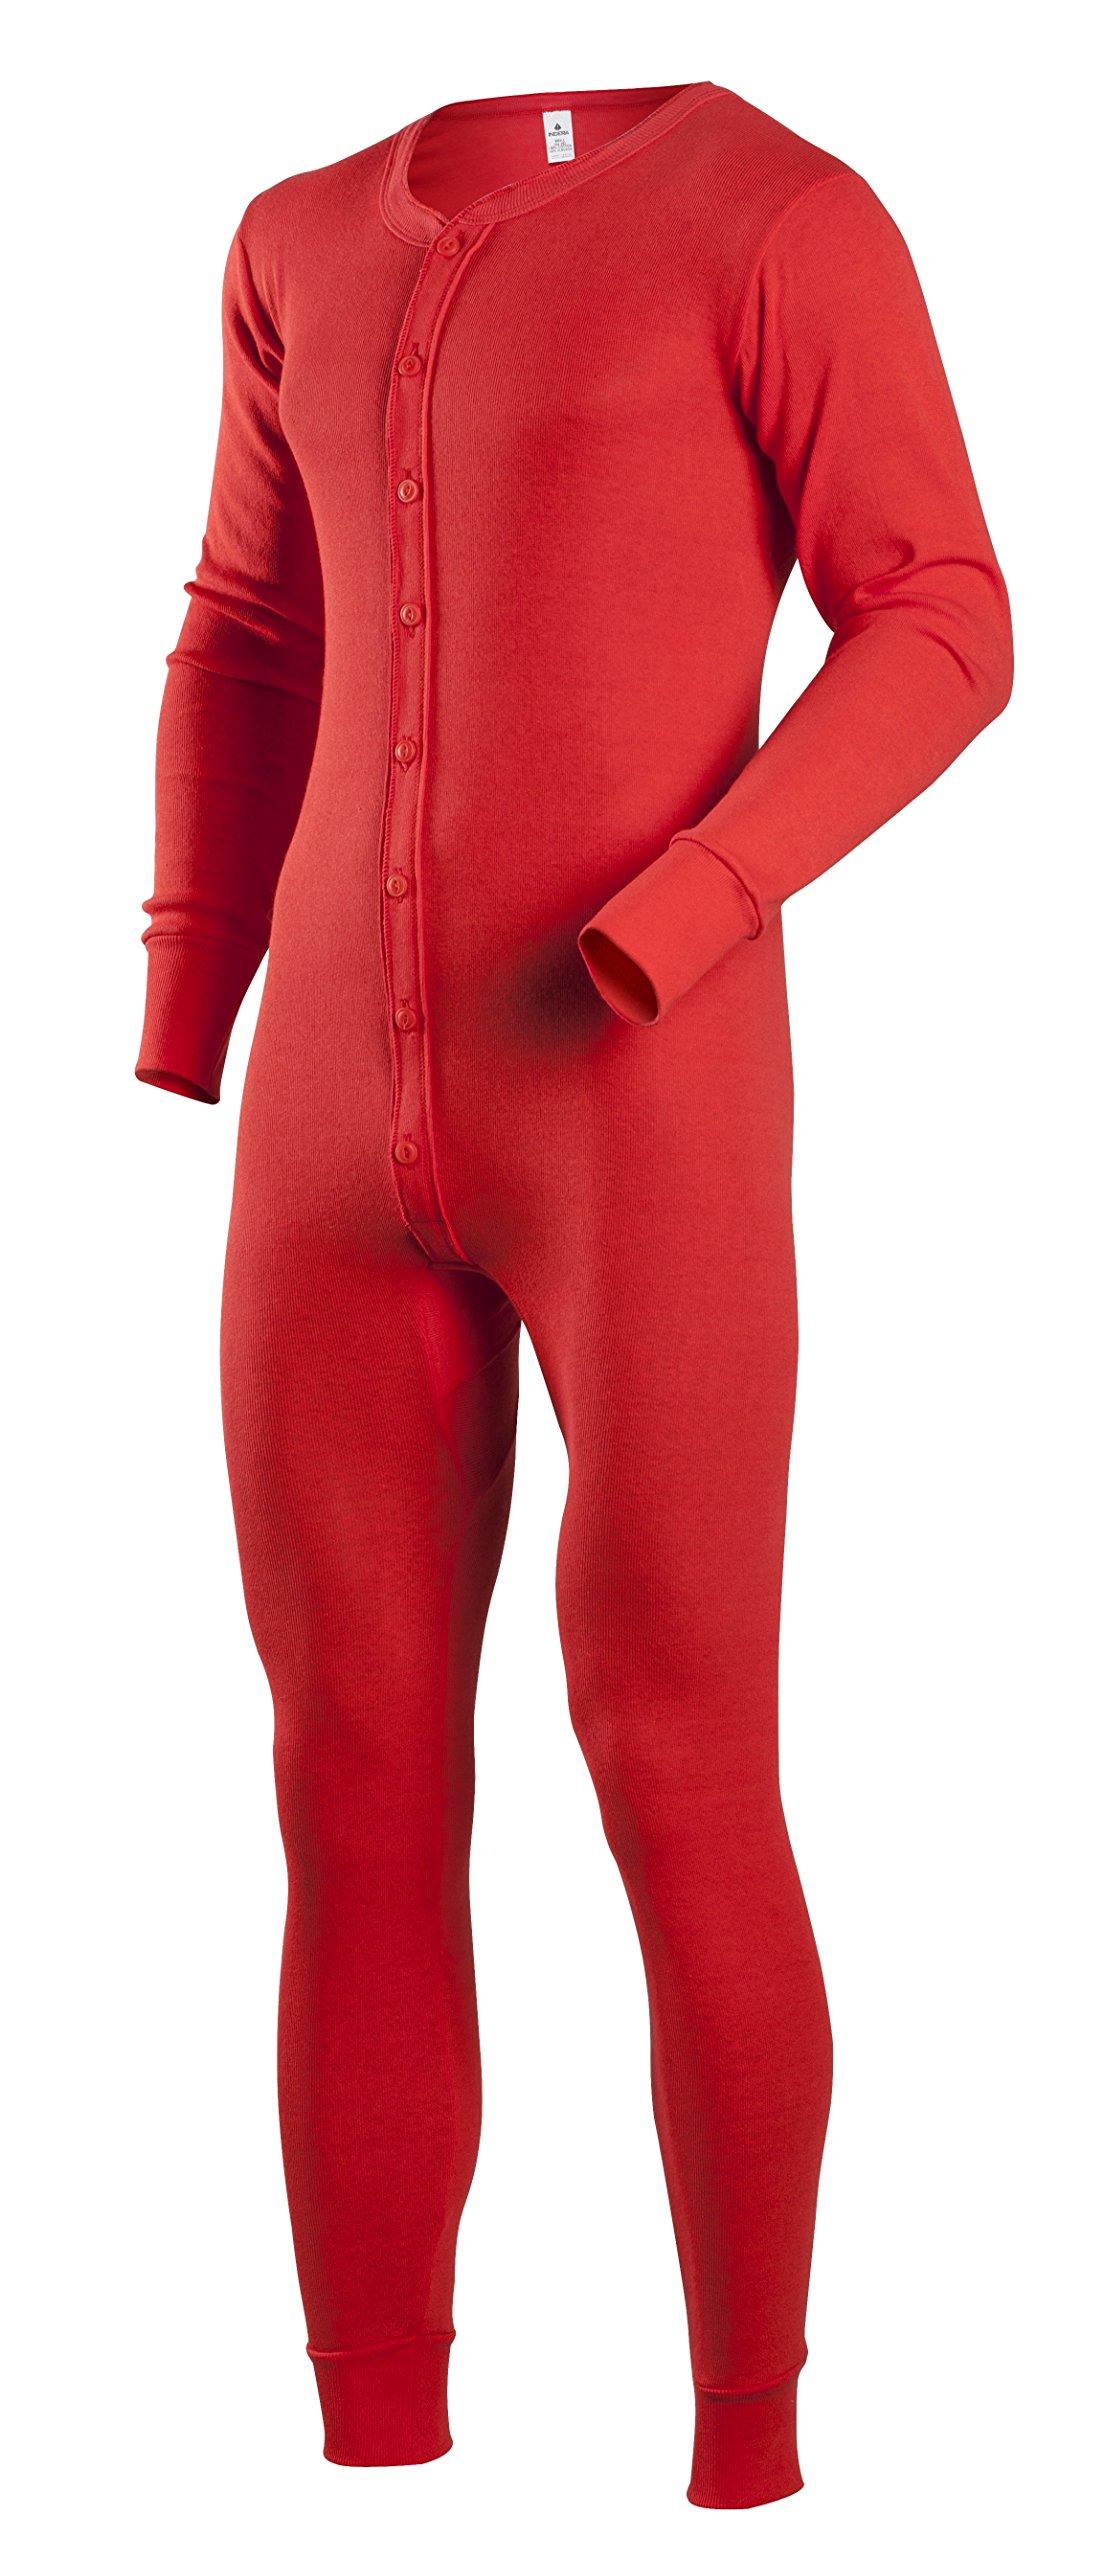 Indera Men's Tall Cotton 1 x 1 Rib Union Suit, Red, Medium